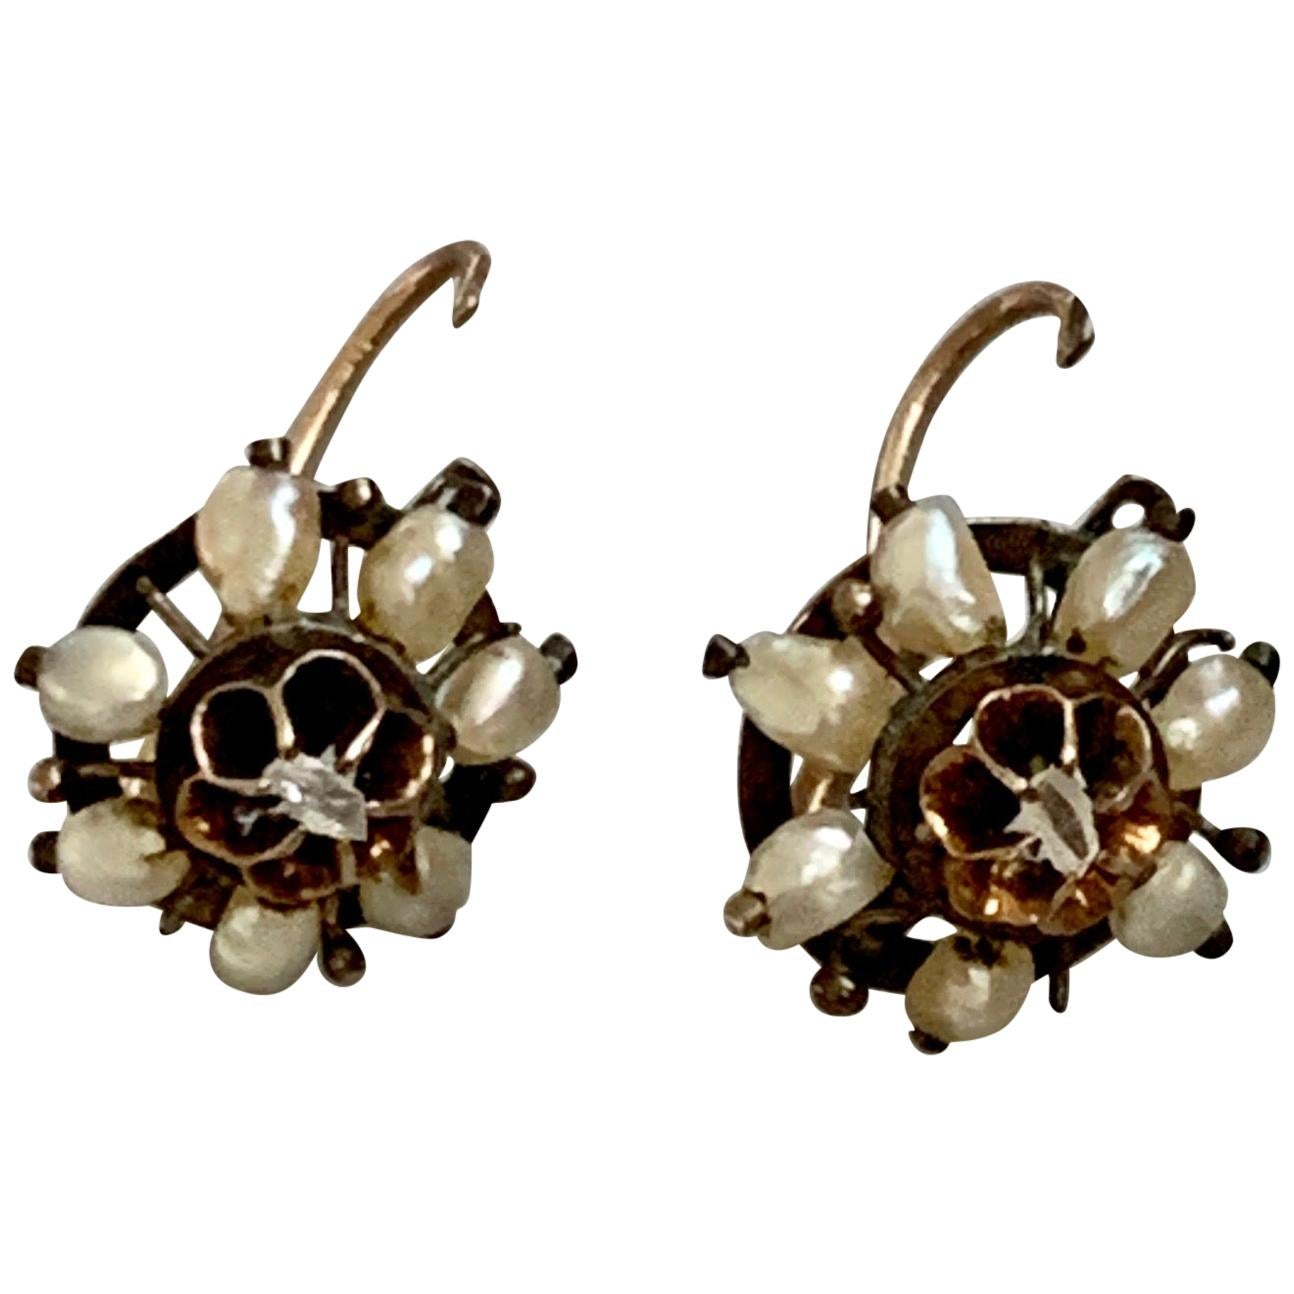 Antique Pearl and Rose Cut Diamond 9 Karat Yellow Front Hook Closure Earrings